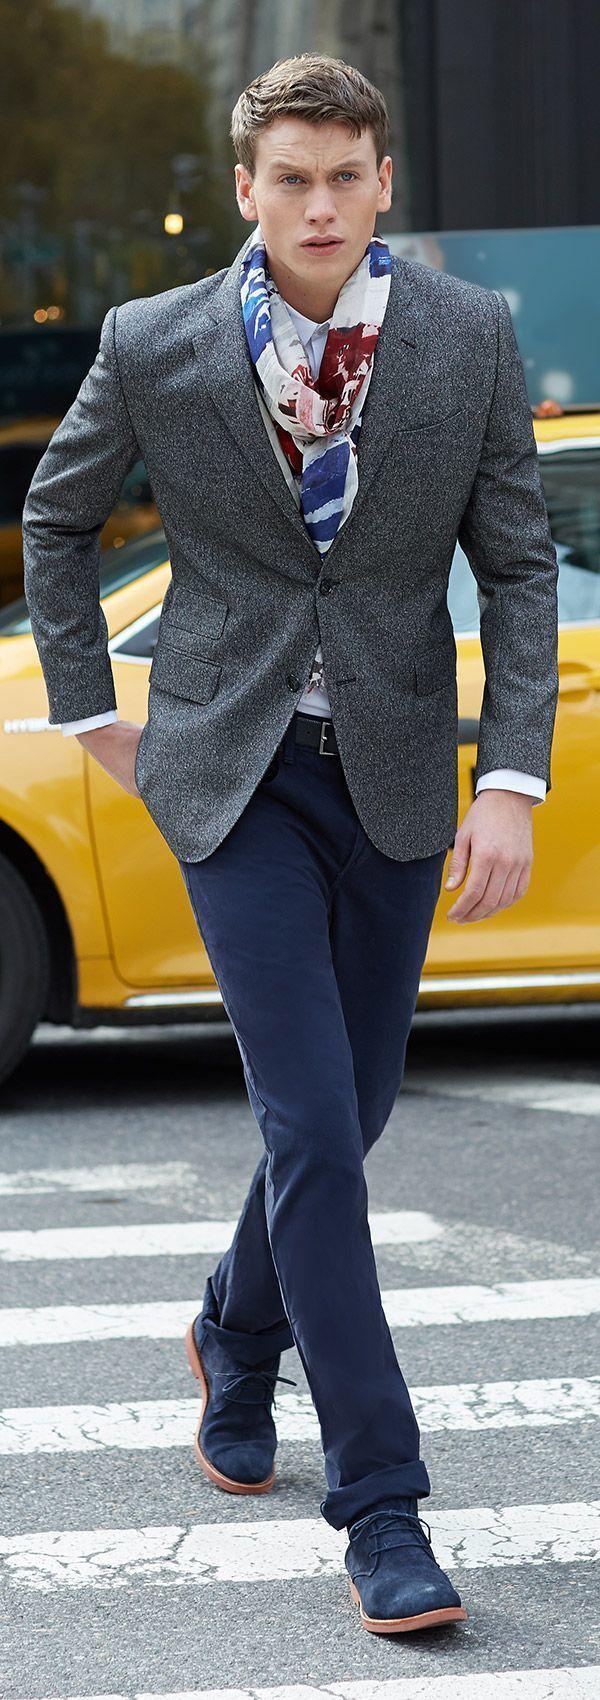 Black dress navy blazer - Men S Grey Wool Blazer White Dress Shirt Navy Chinos Navy Suede Desert Boots Men S Fashion